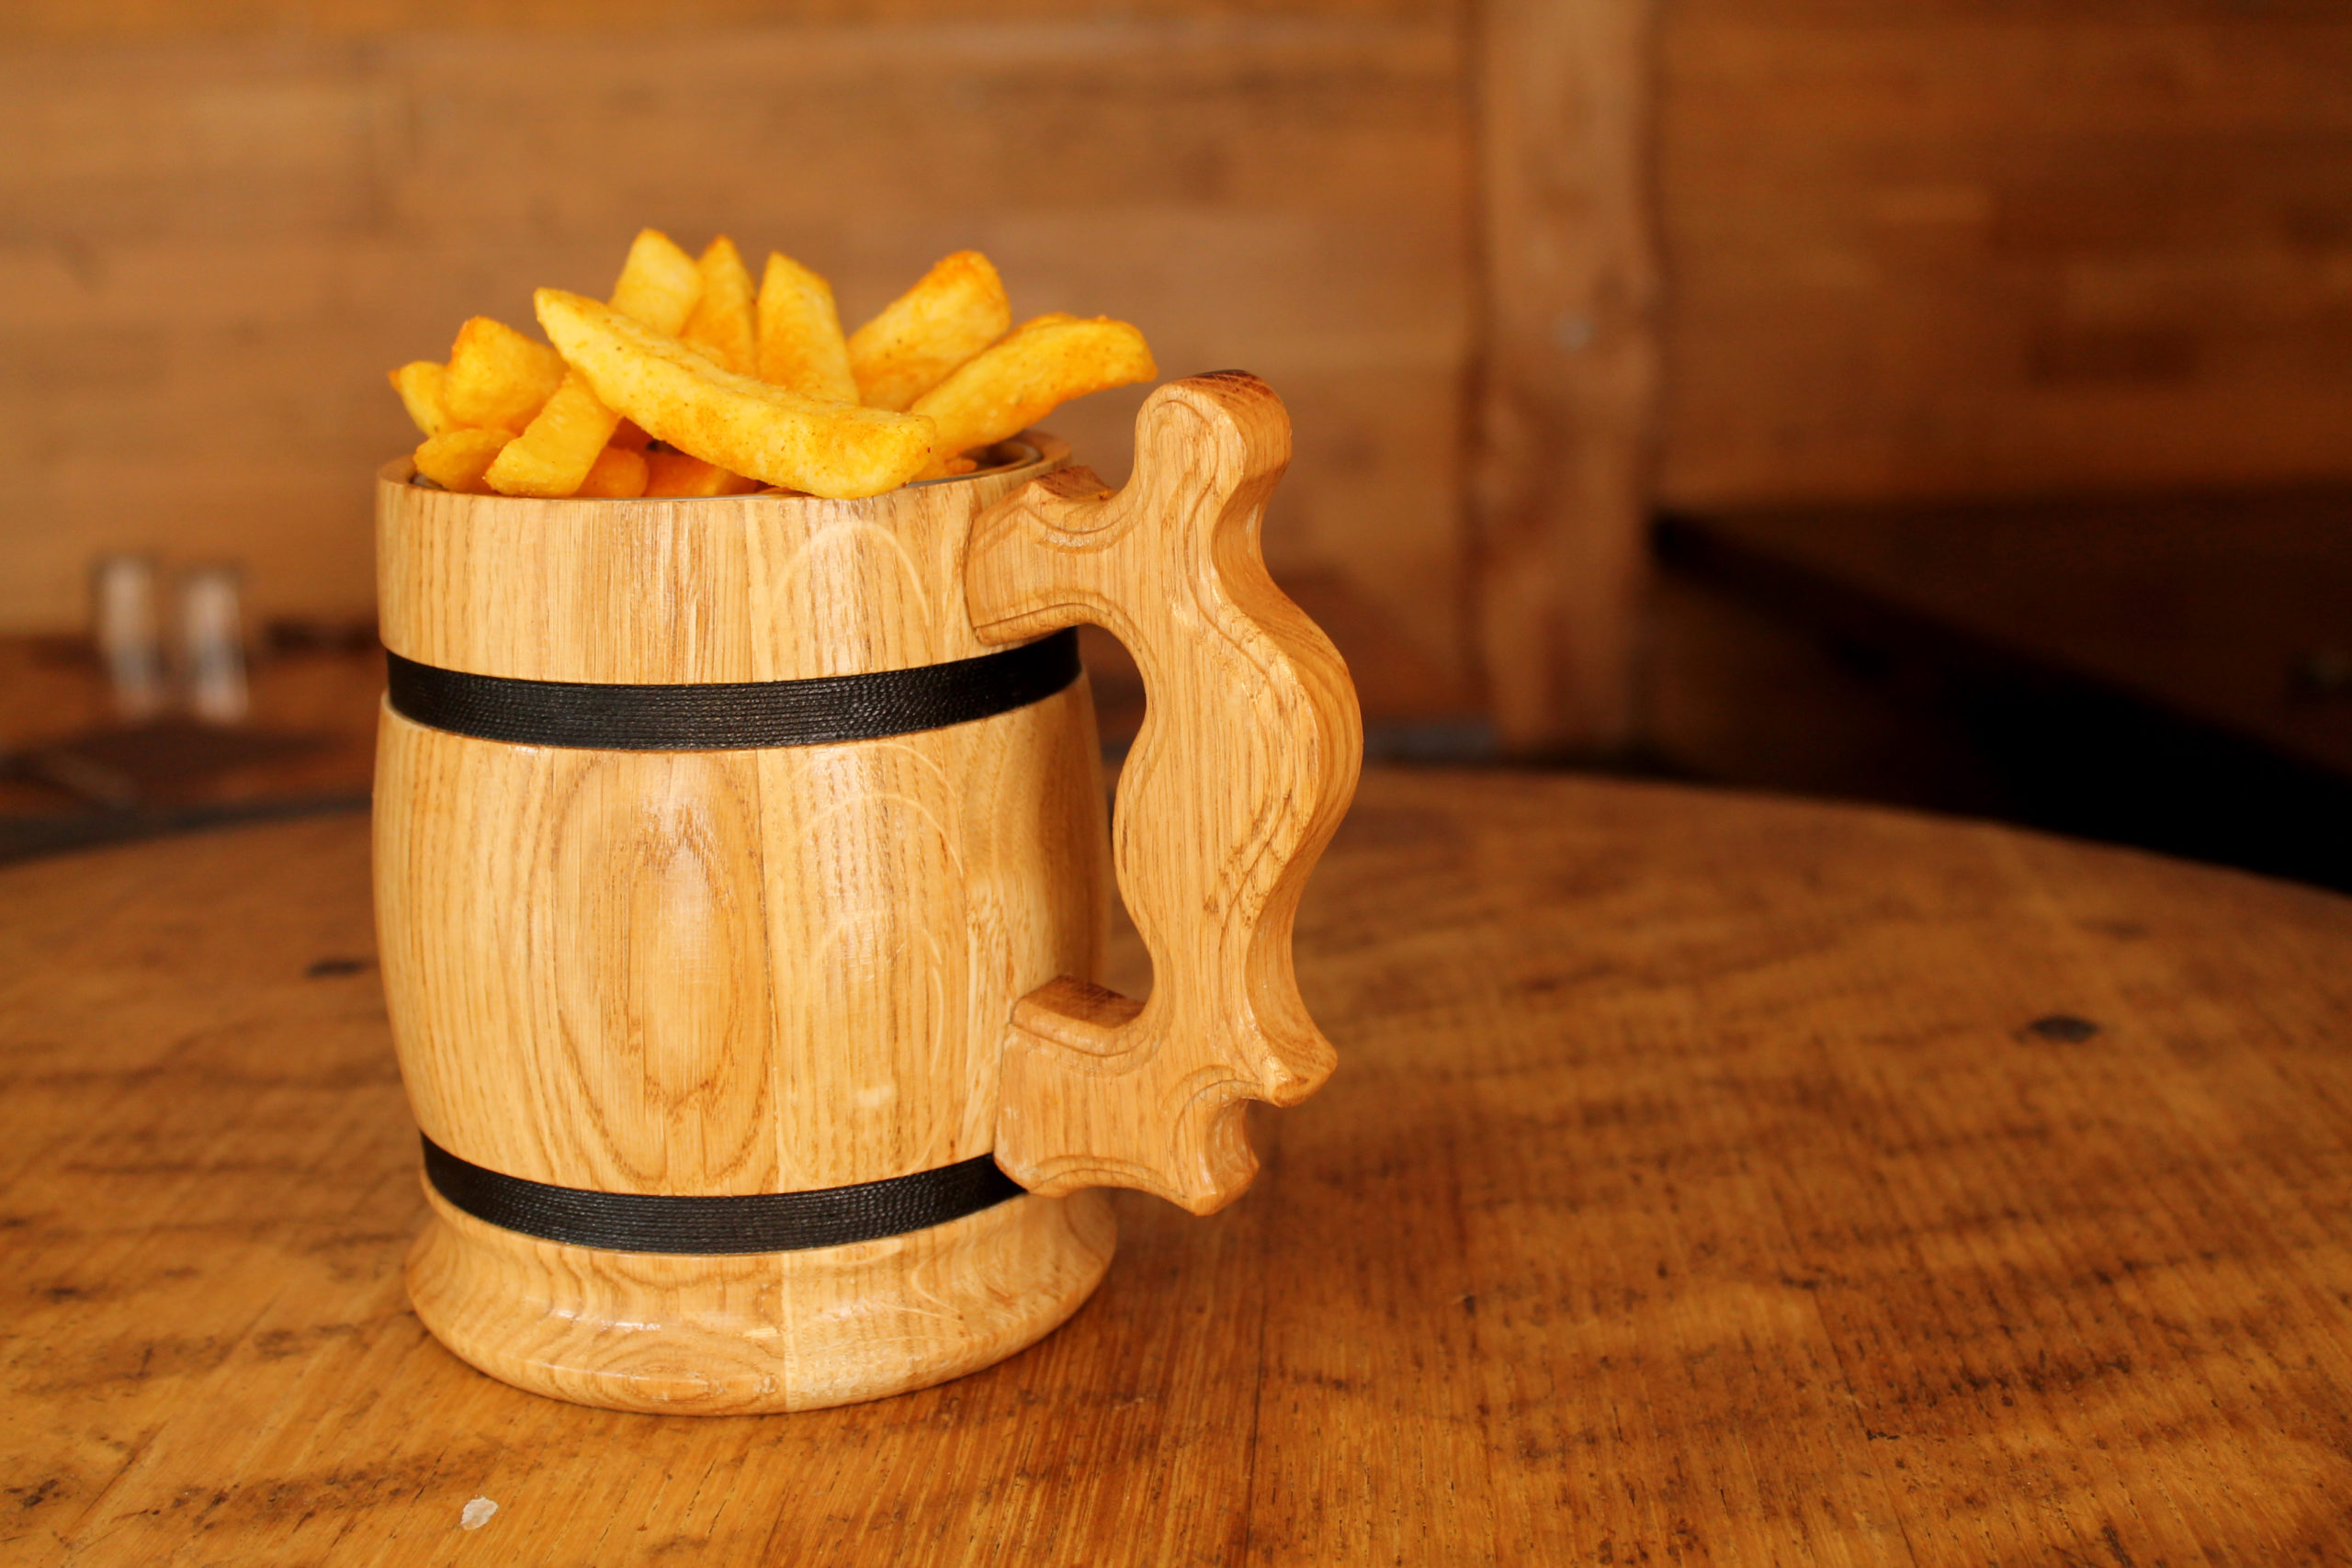 Chope à frites - Prise par Nob Guérin